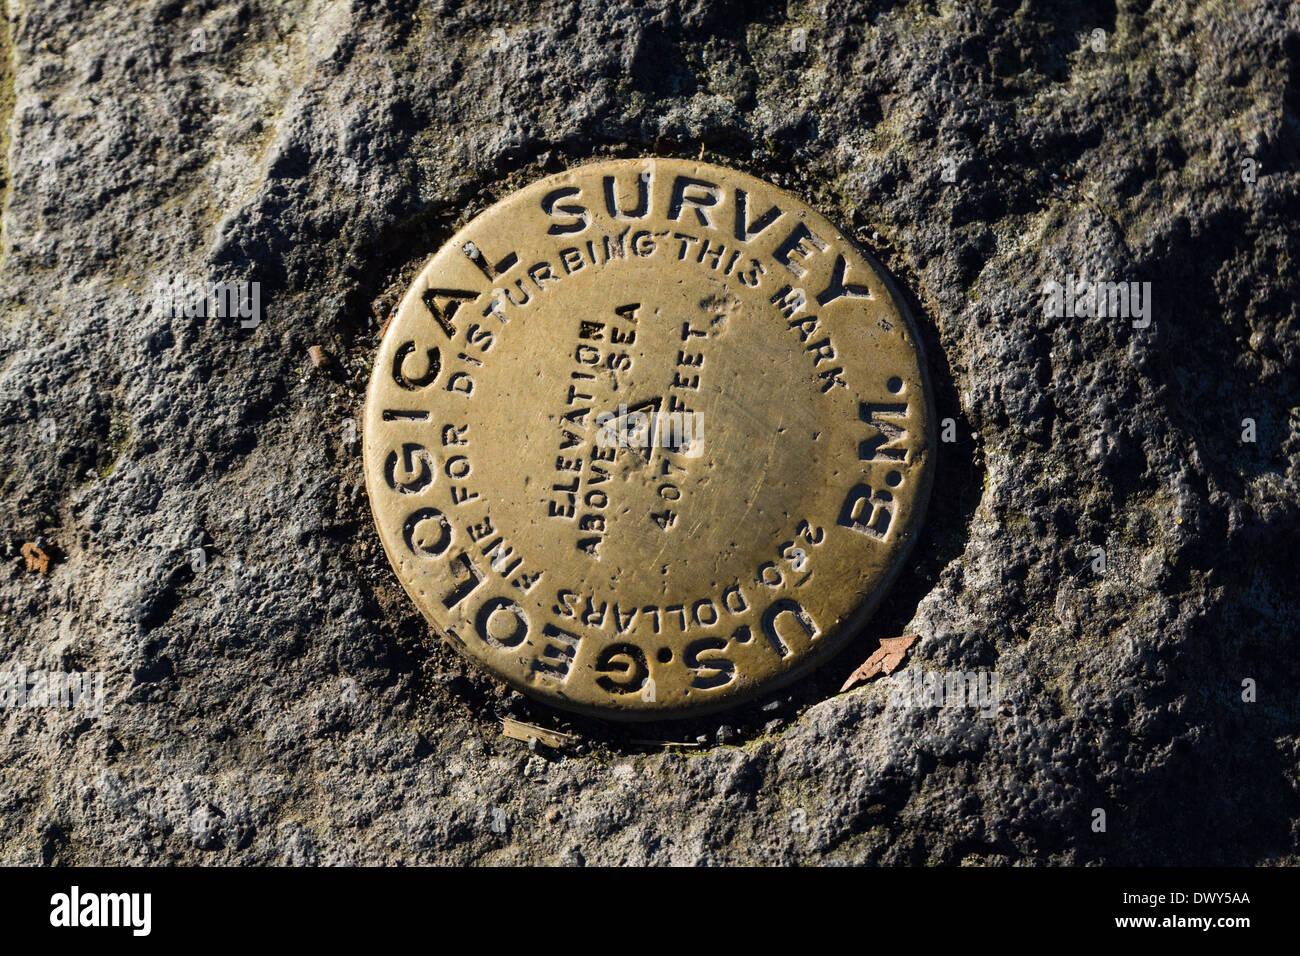 US Geological Survey Marker. Hawaii Volcanoes National Park, Big Island, Hawaii, USA. - Stock Image